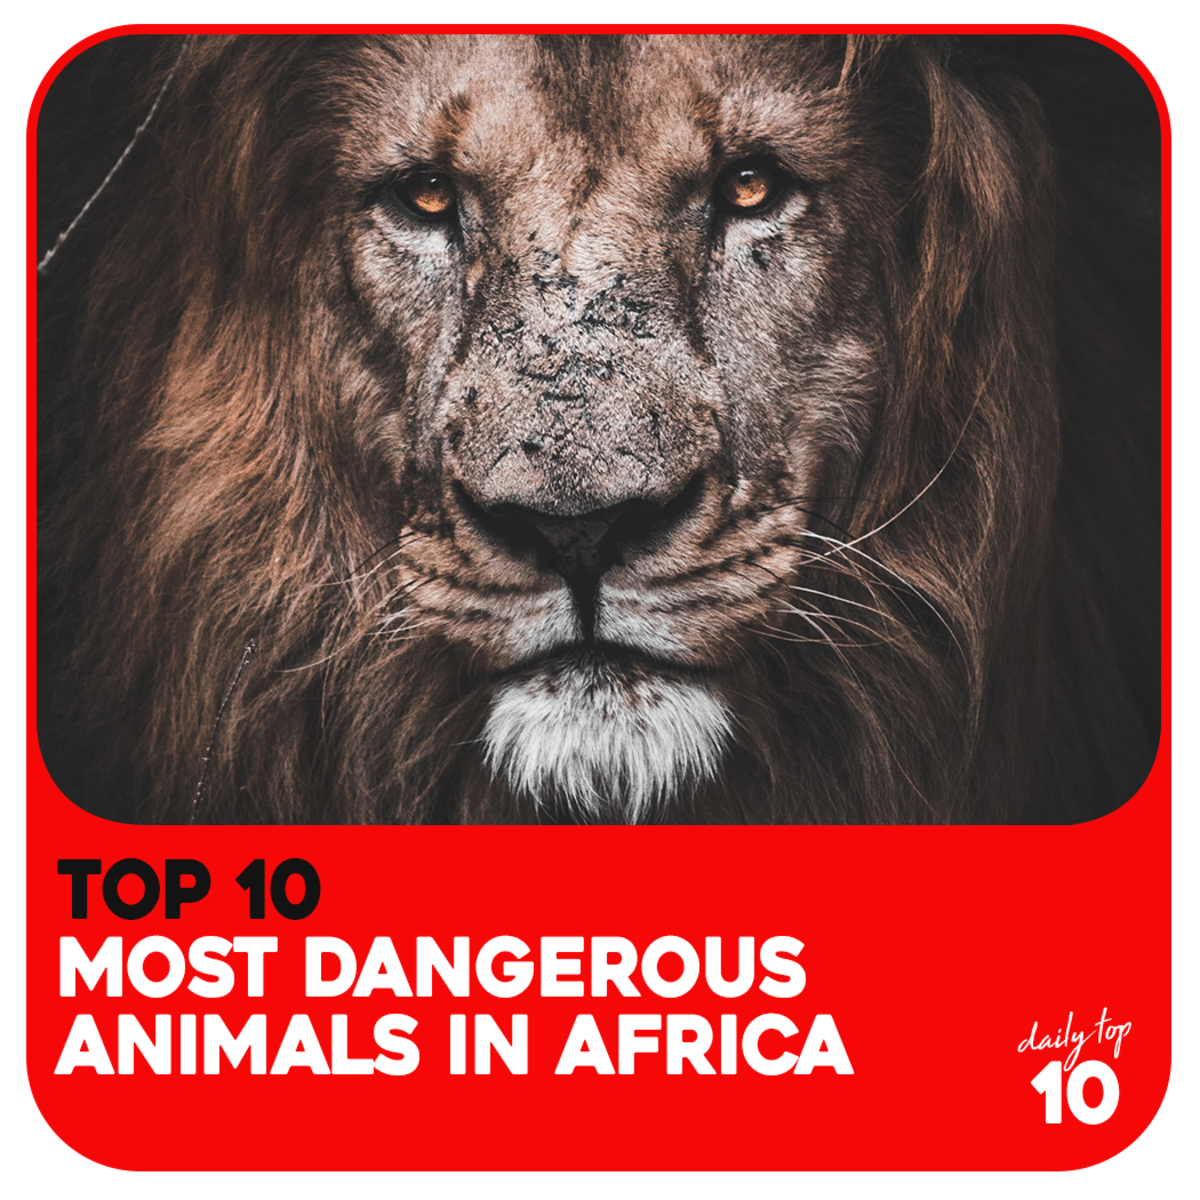 top-10-most-dangerous-animals-in-africa